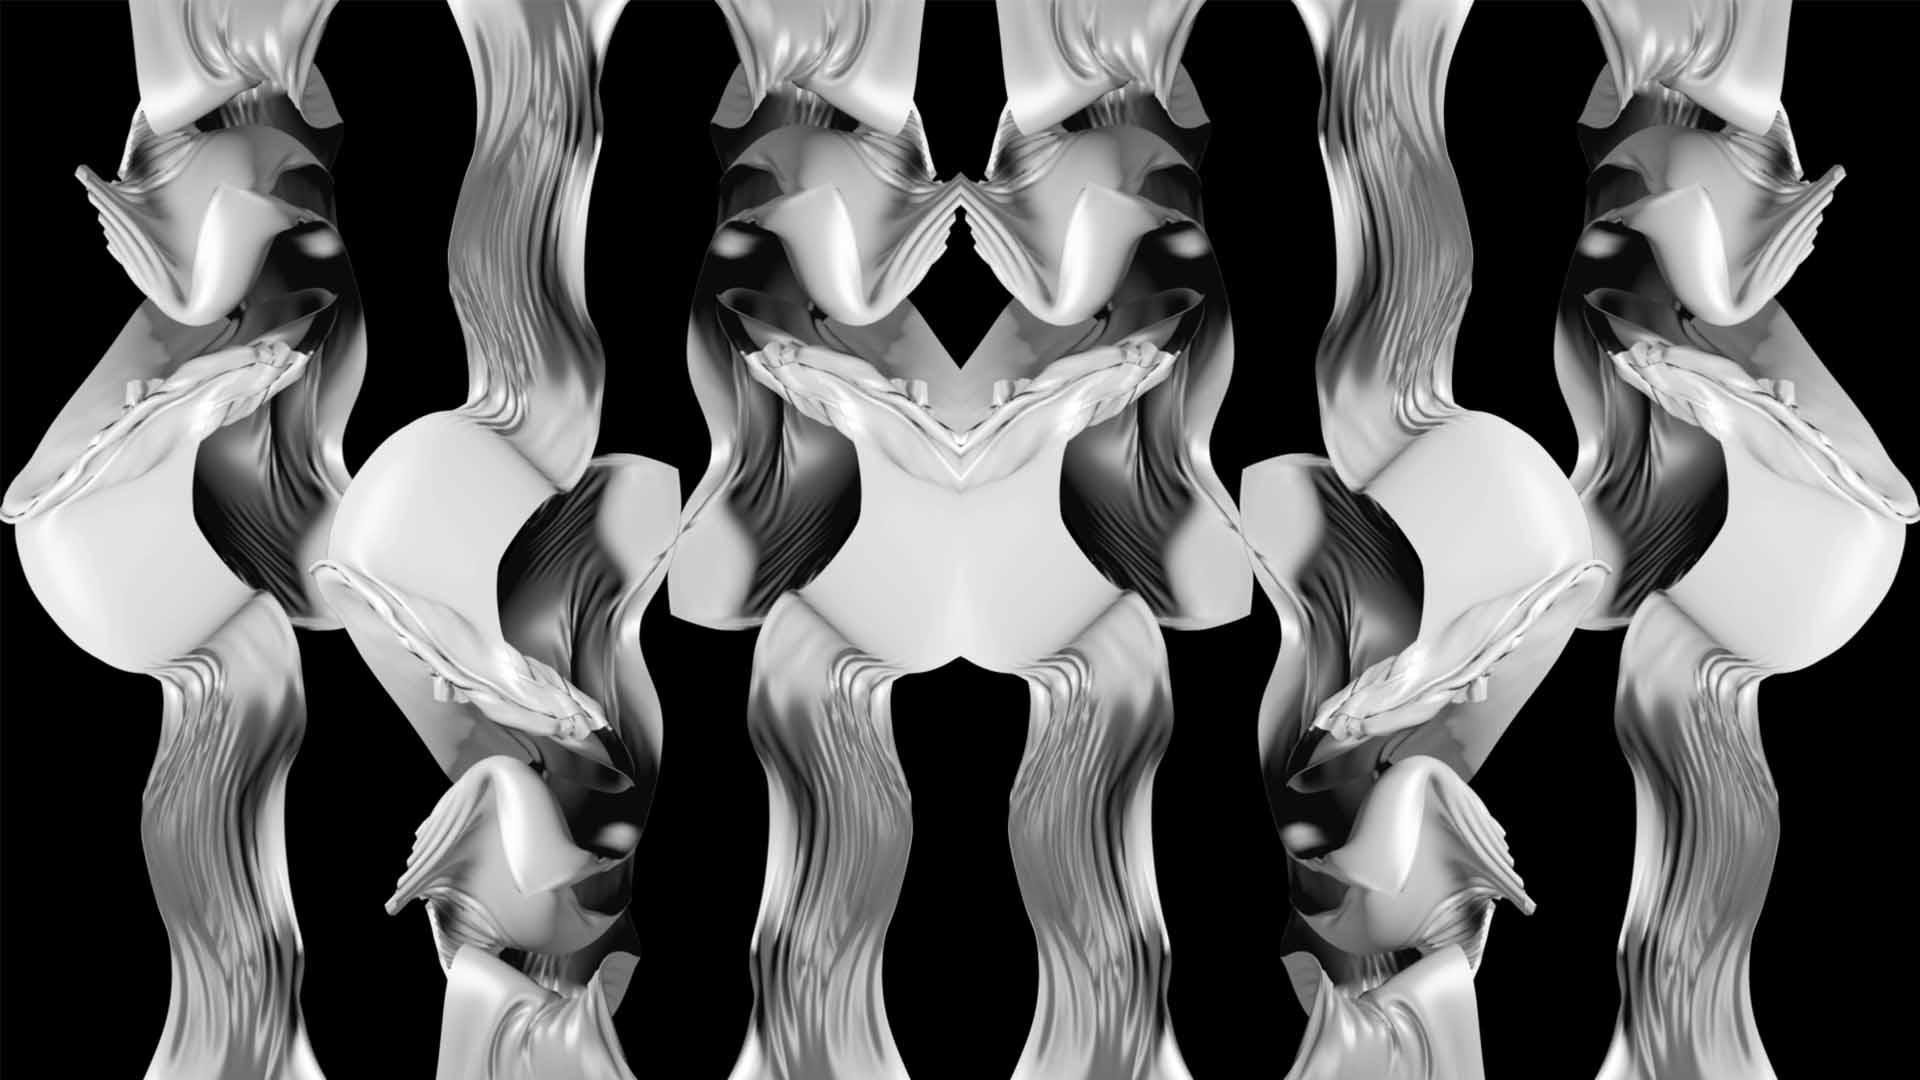 Clothing_3D_Curtain_Animation